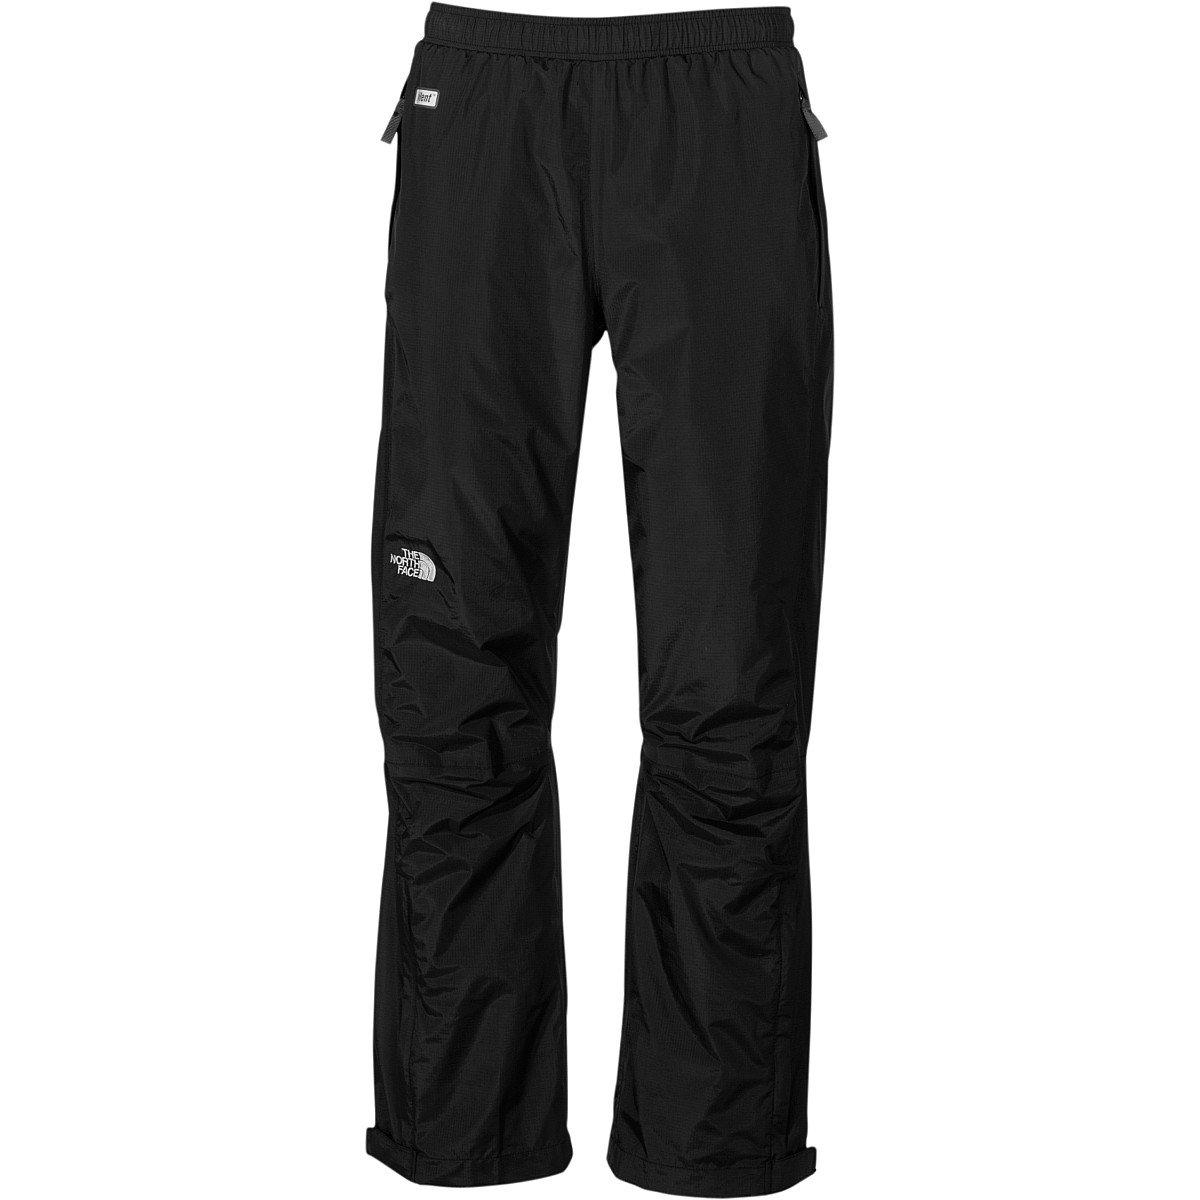 The North Face Men s Resolve Pant, Regular (tamaño: S): Amazon.es ...